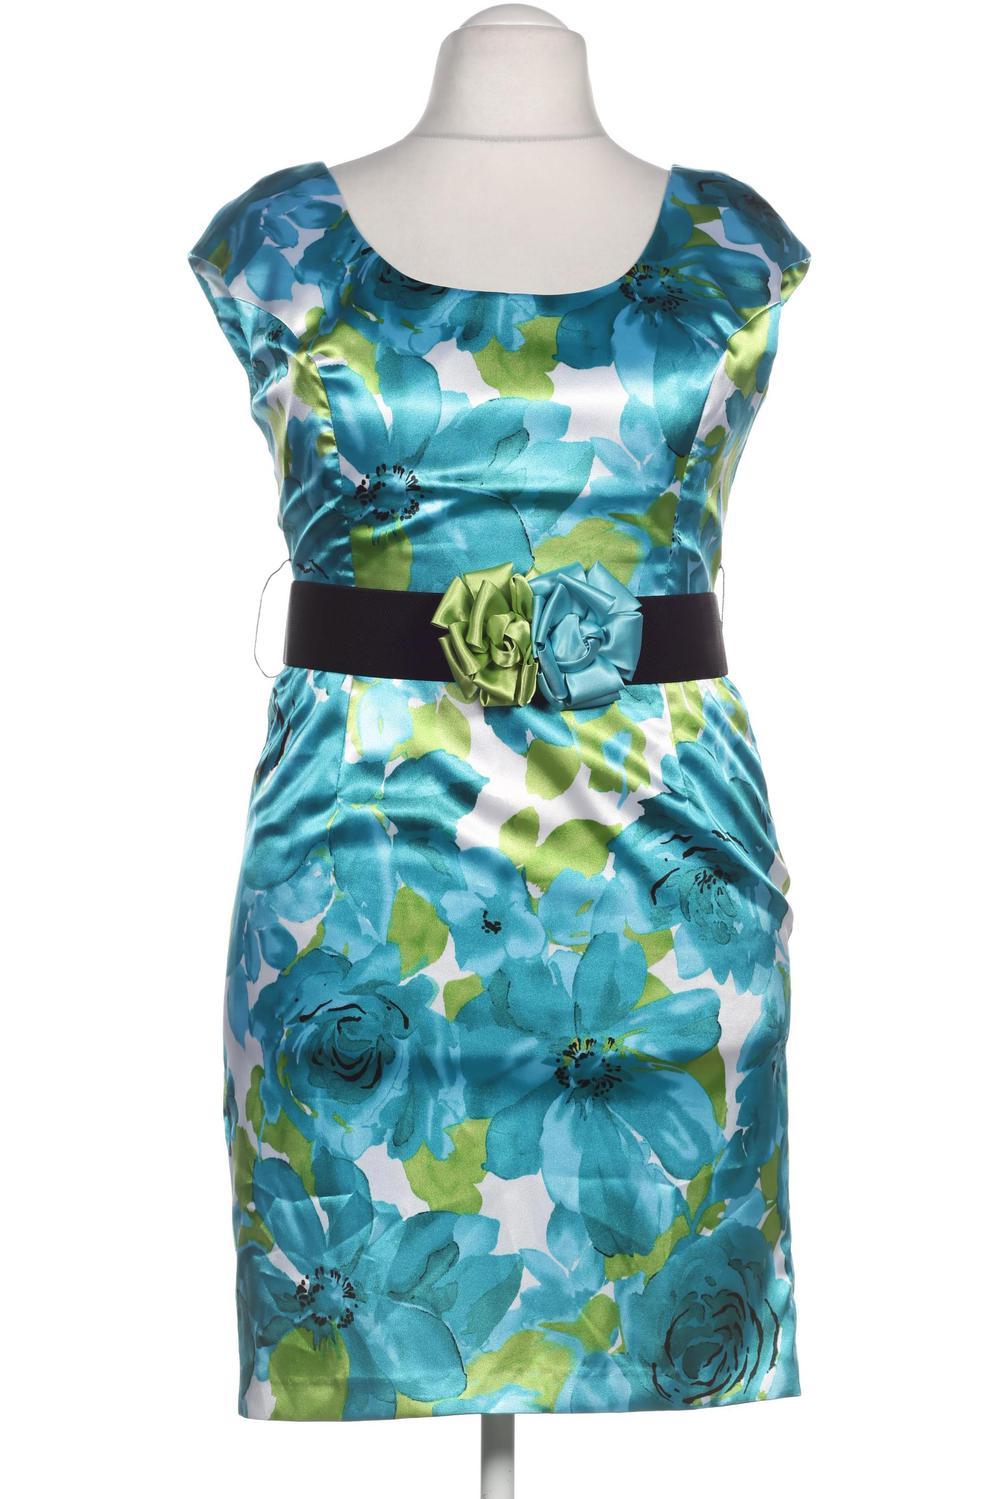 Joseph Ribkoff Damen Kleid DE 44 Second Hand kaufen | ubup